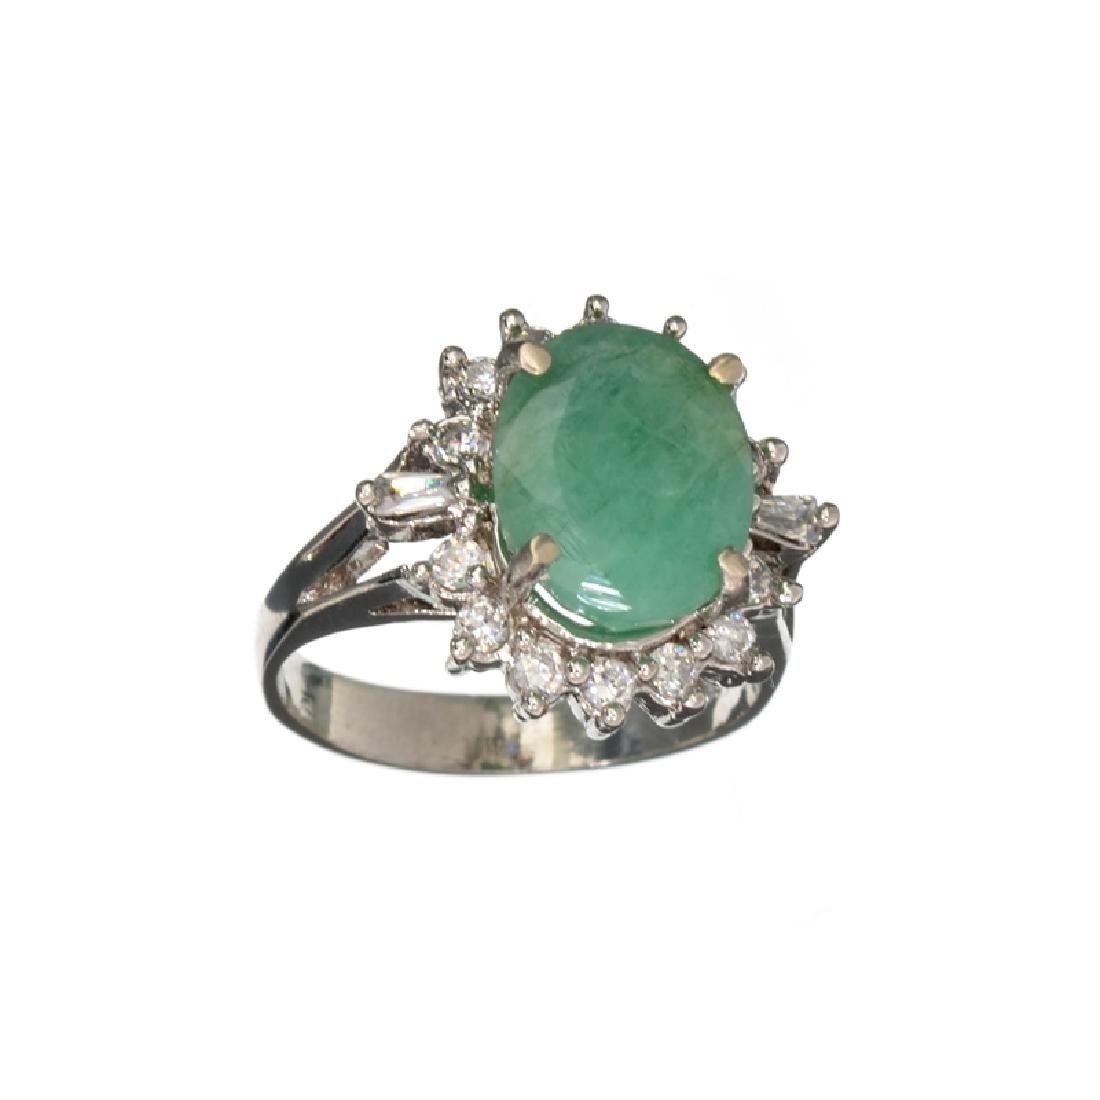 APP: 1.5k Fine Jewelry 3.66CT Oval Cut Green Emerald